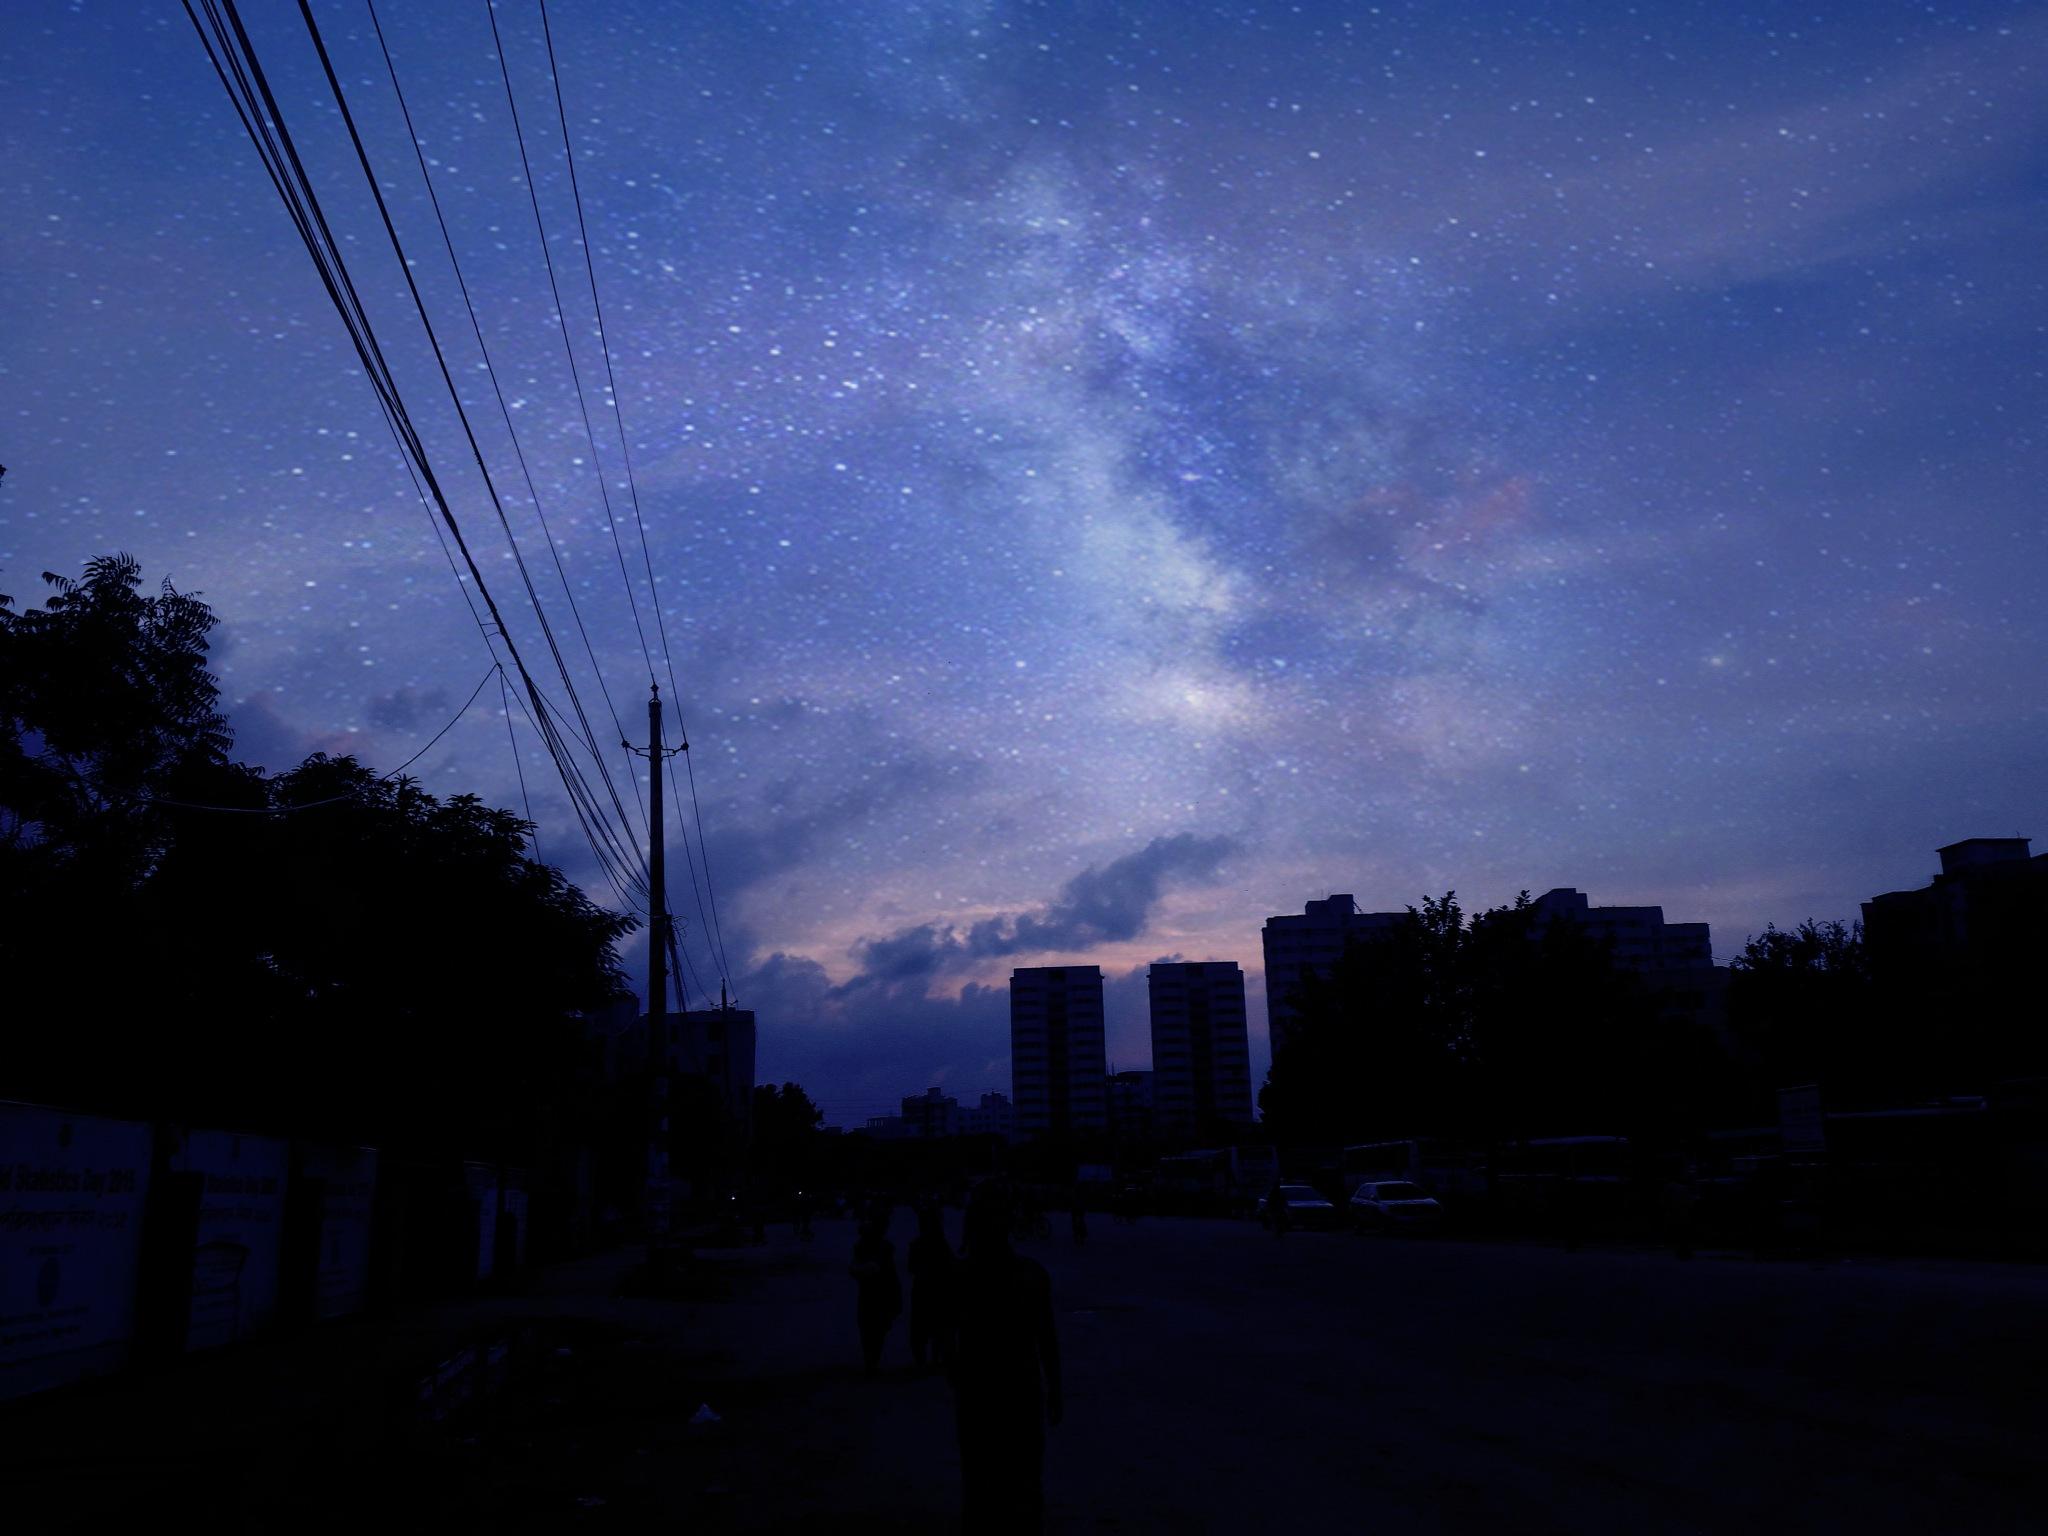 Milkway in city night by Md. Ashraful Islam